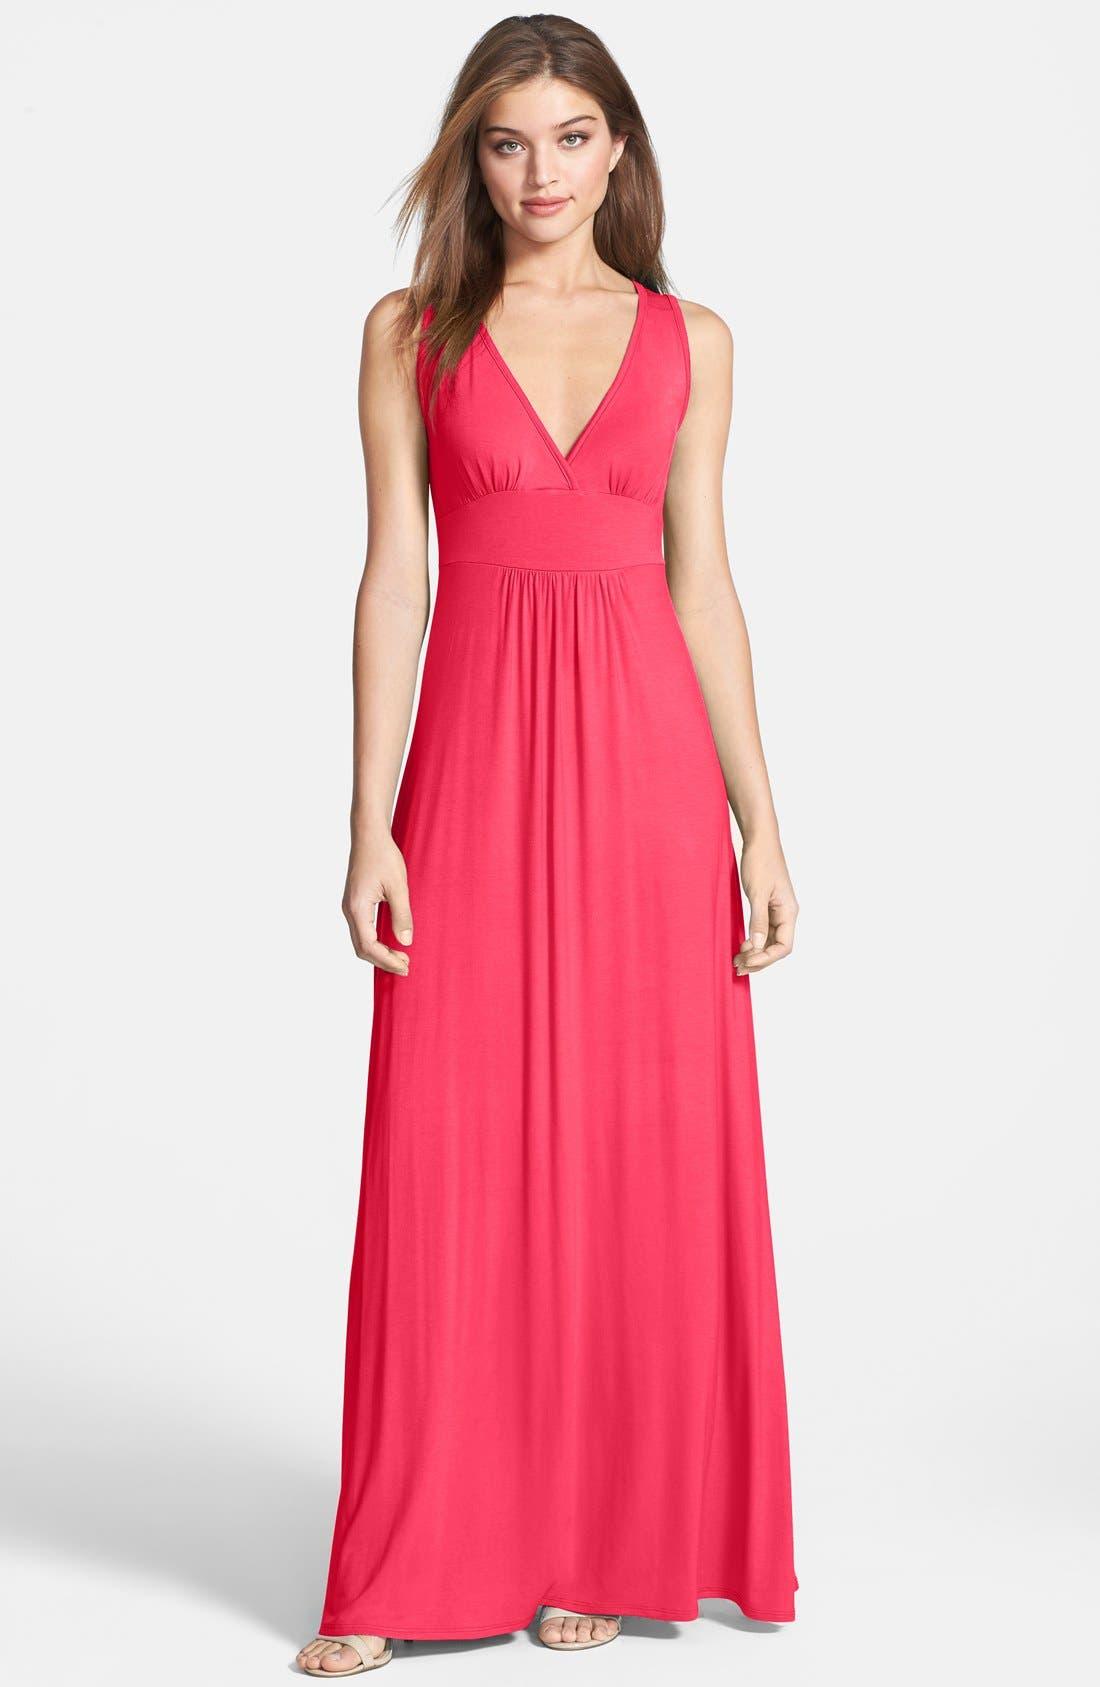 Main Image - Loveappella V-Neck Stretch Knit Maxi Dress